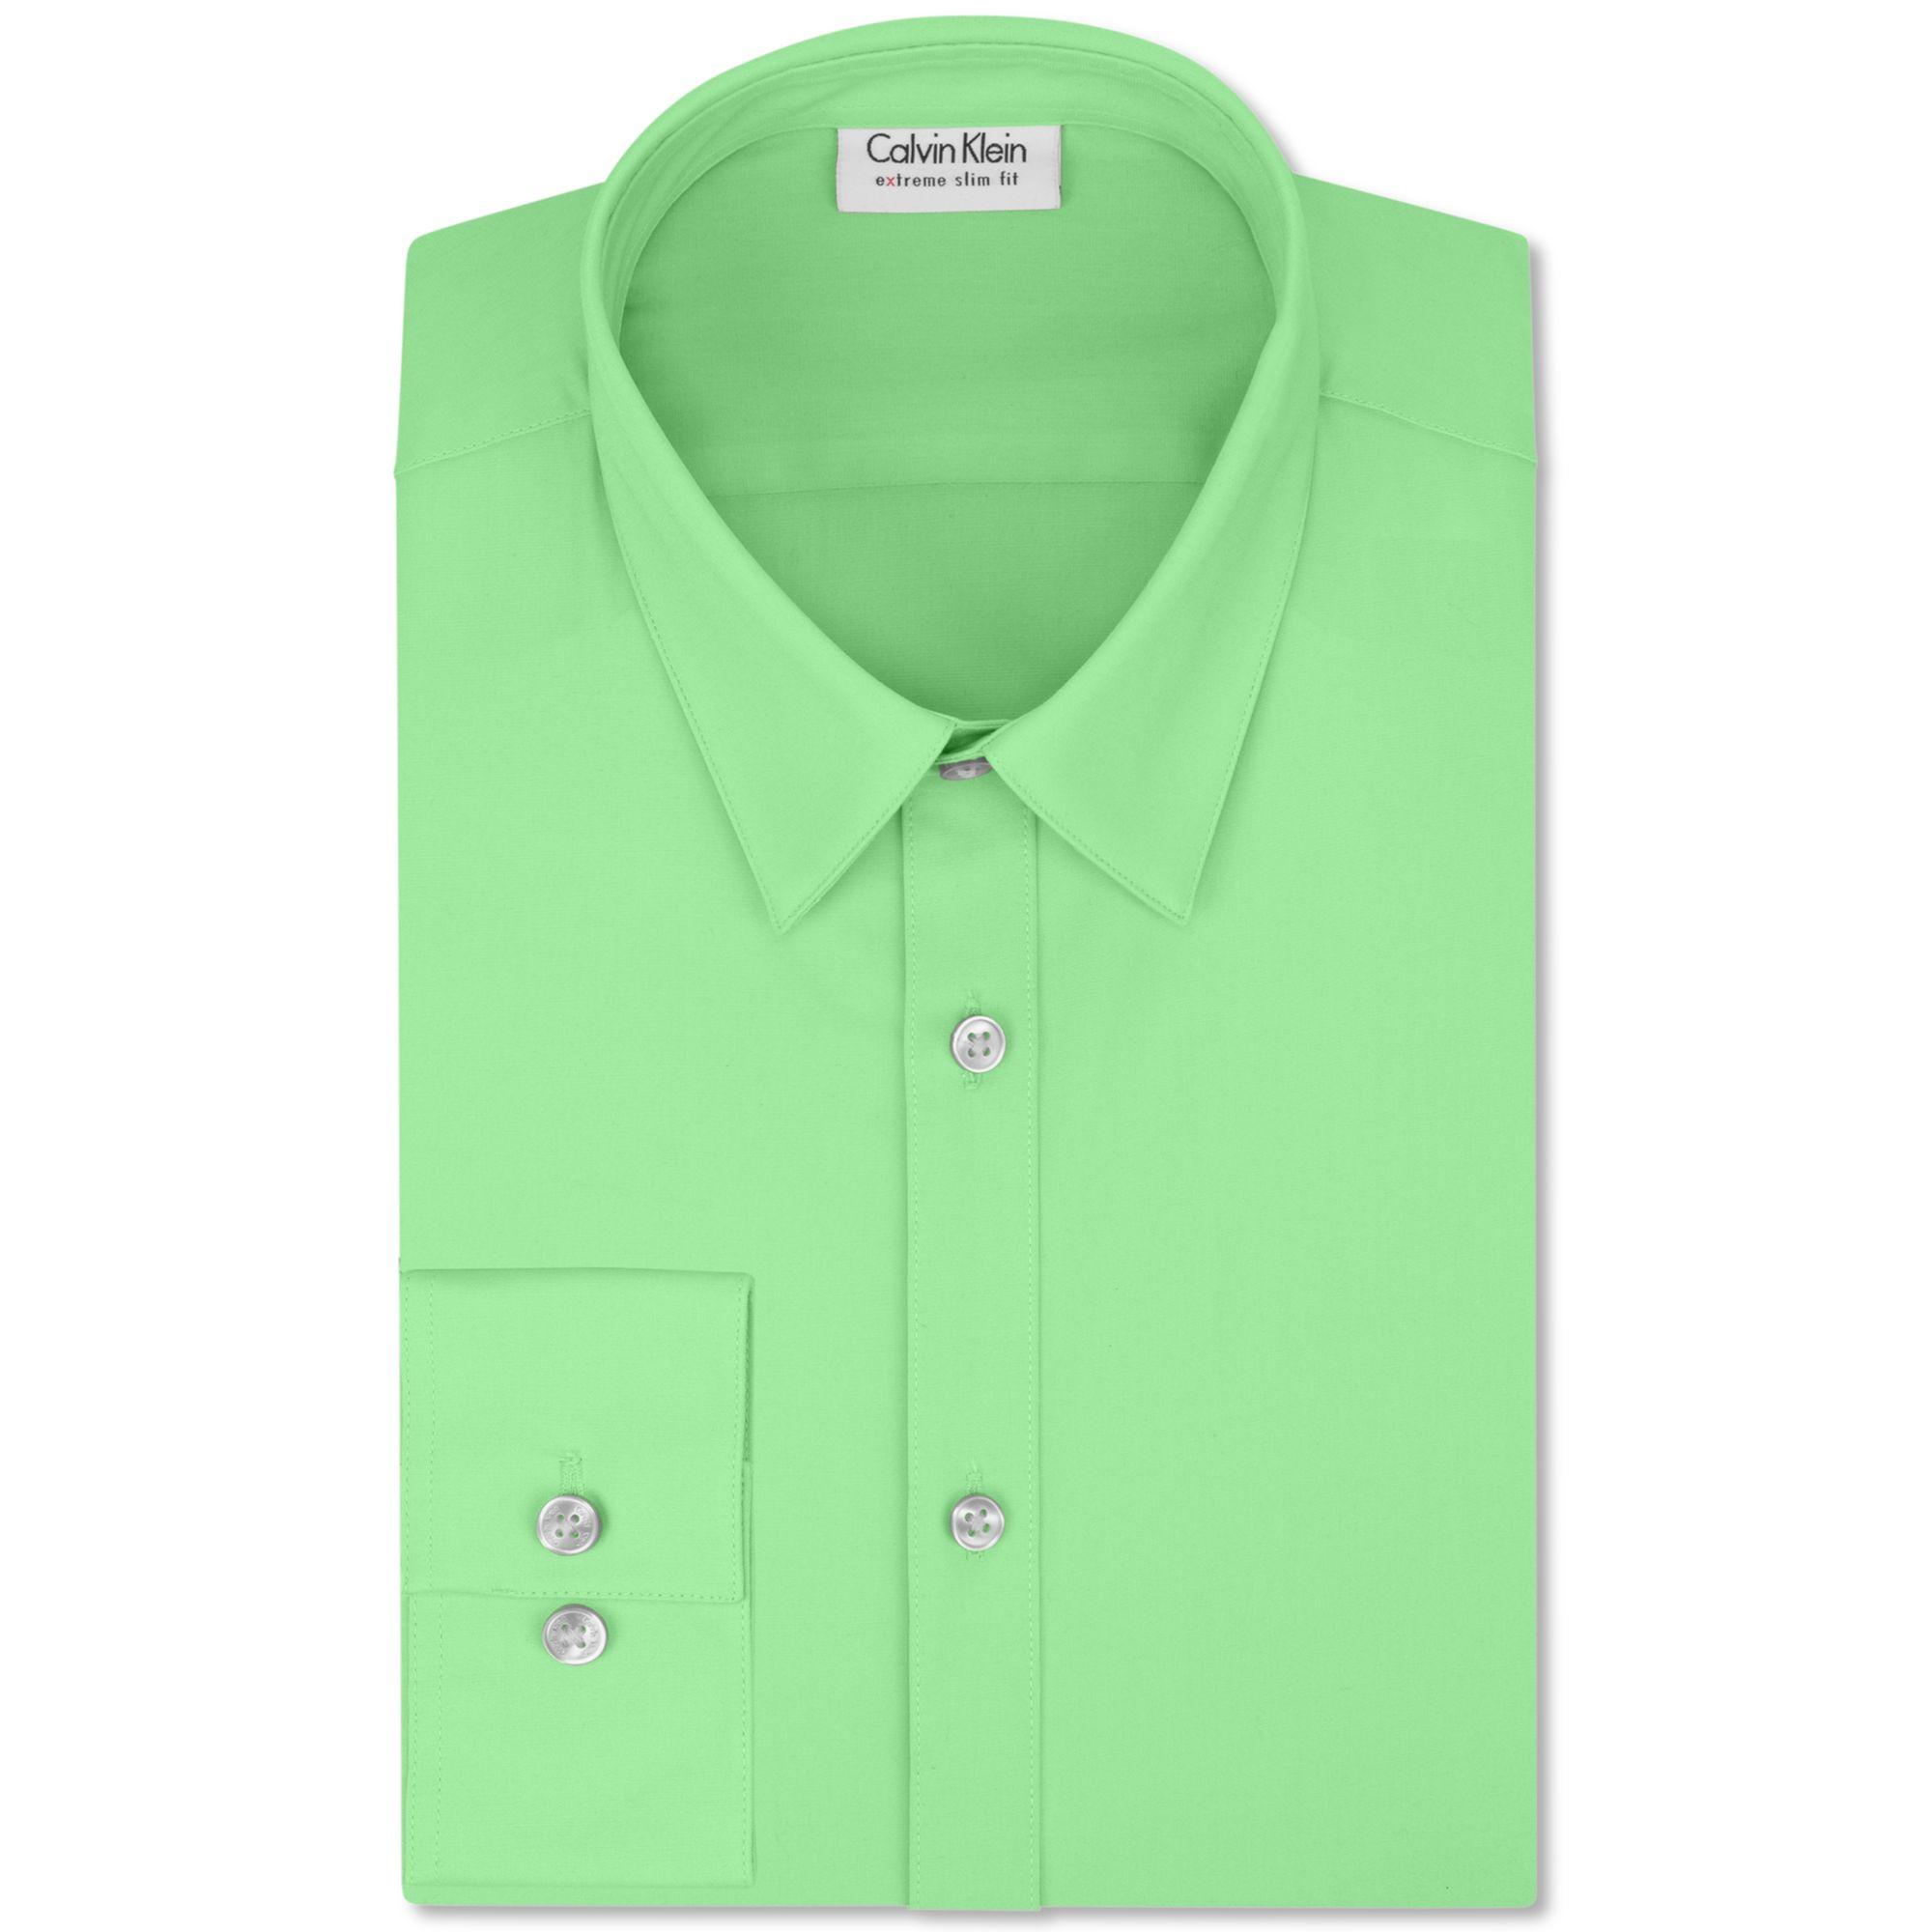 Calvin klein x extra slim fit solid dress shirt in green for Calvin klein x fit dress shirt